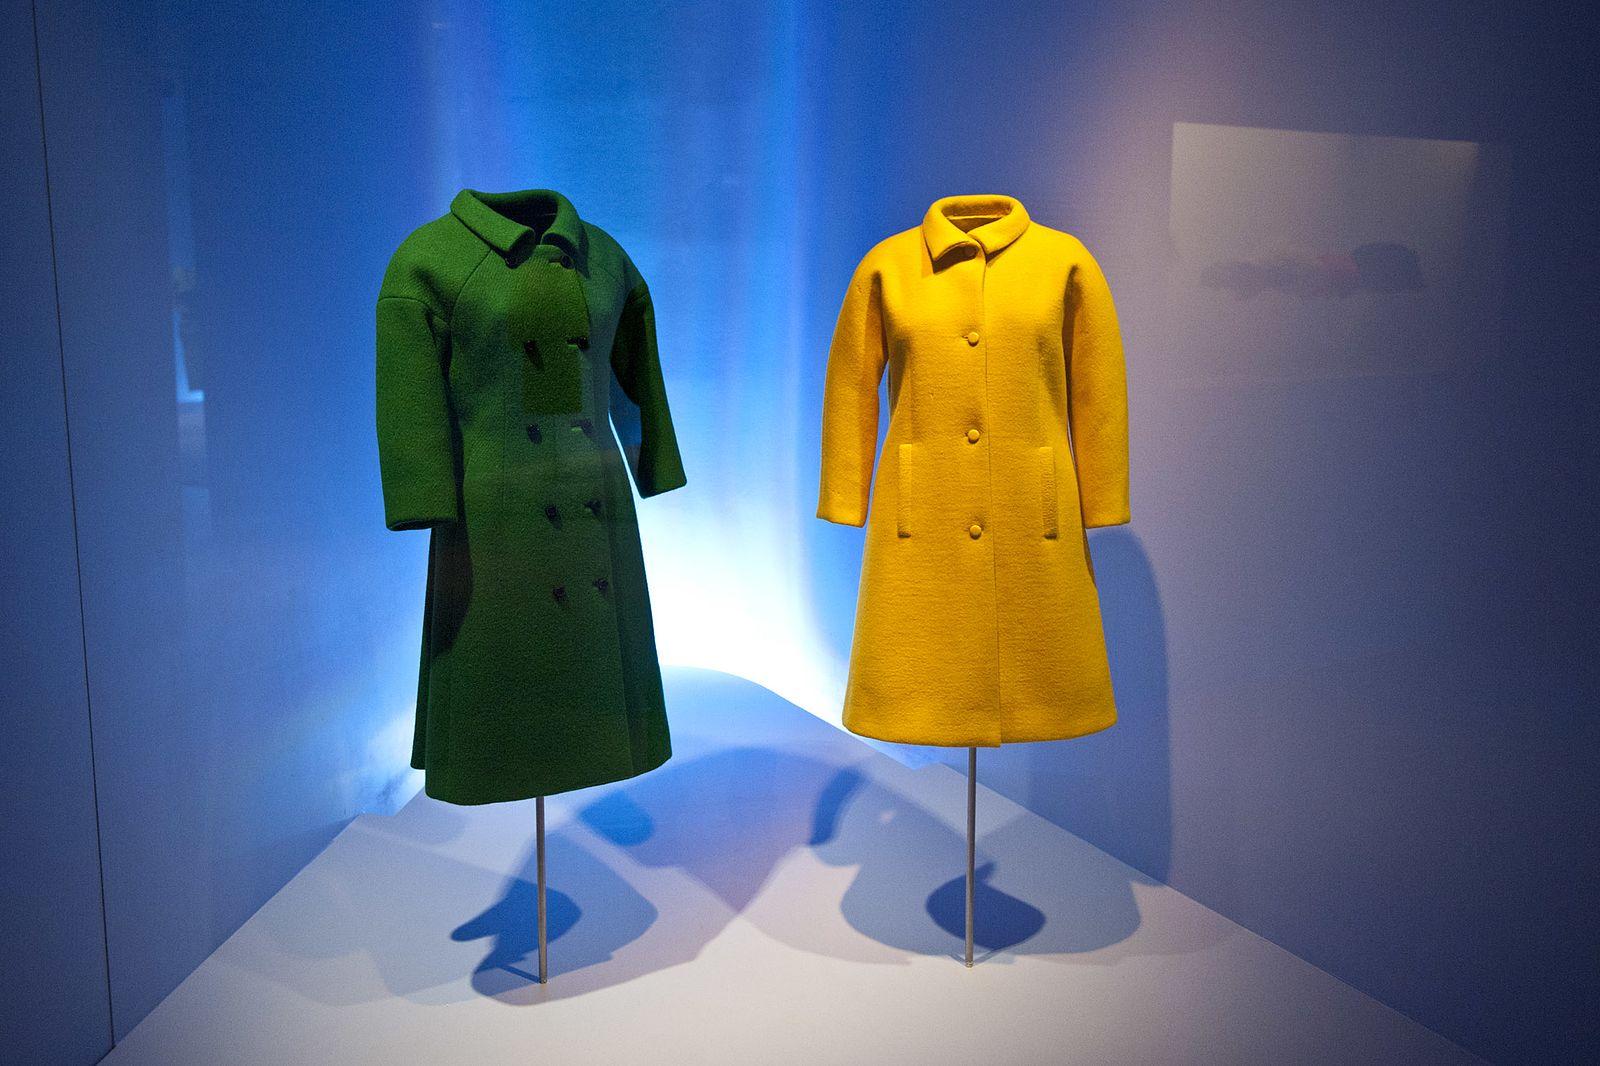 Two Coats by Balenciaga. (Image Credit: Irekia [CC BY 2.0], via Wikimedia Commons)